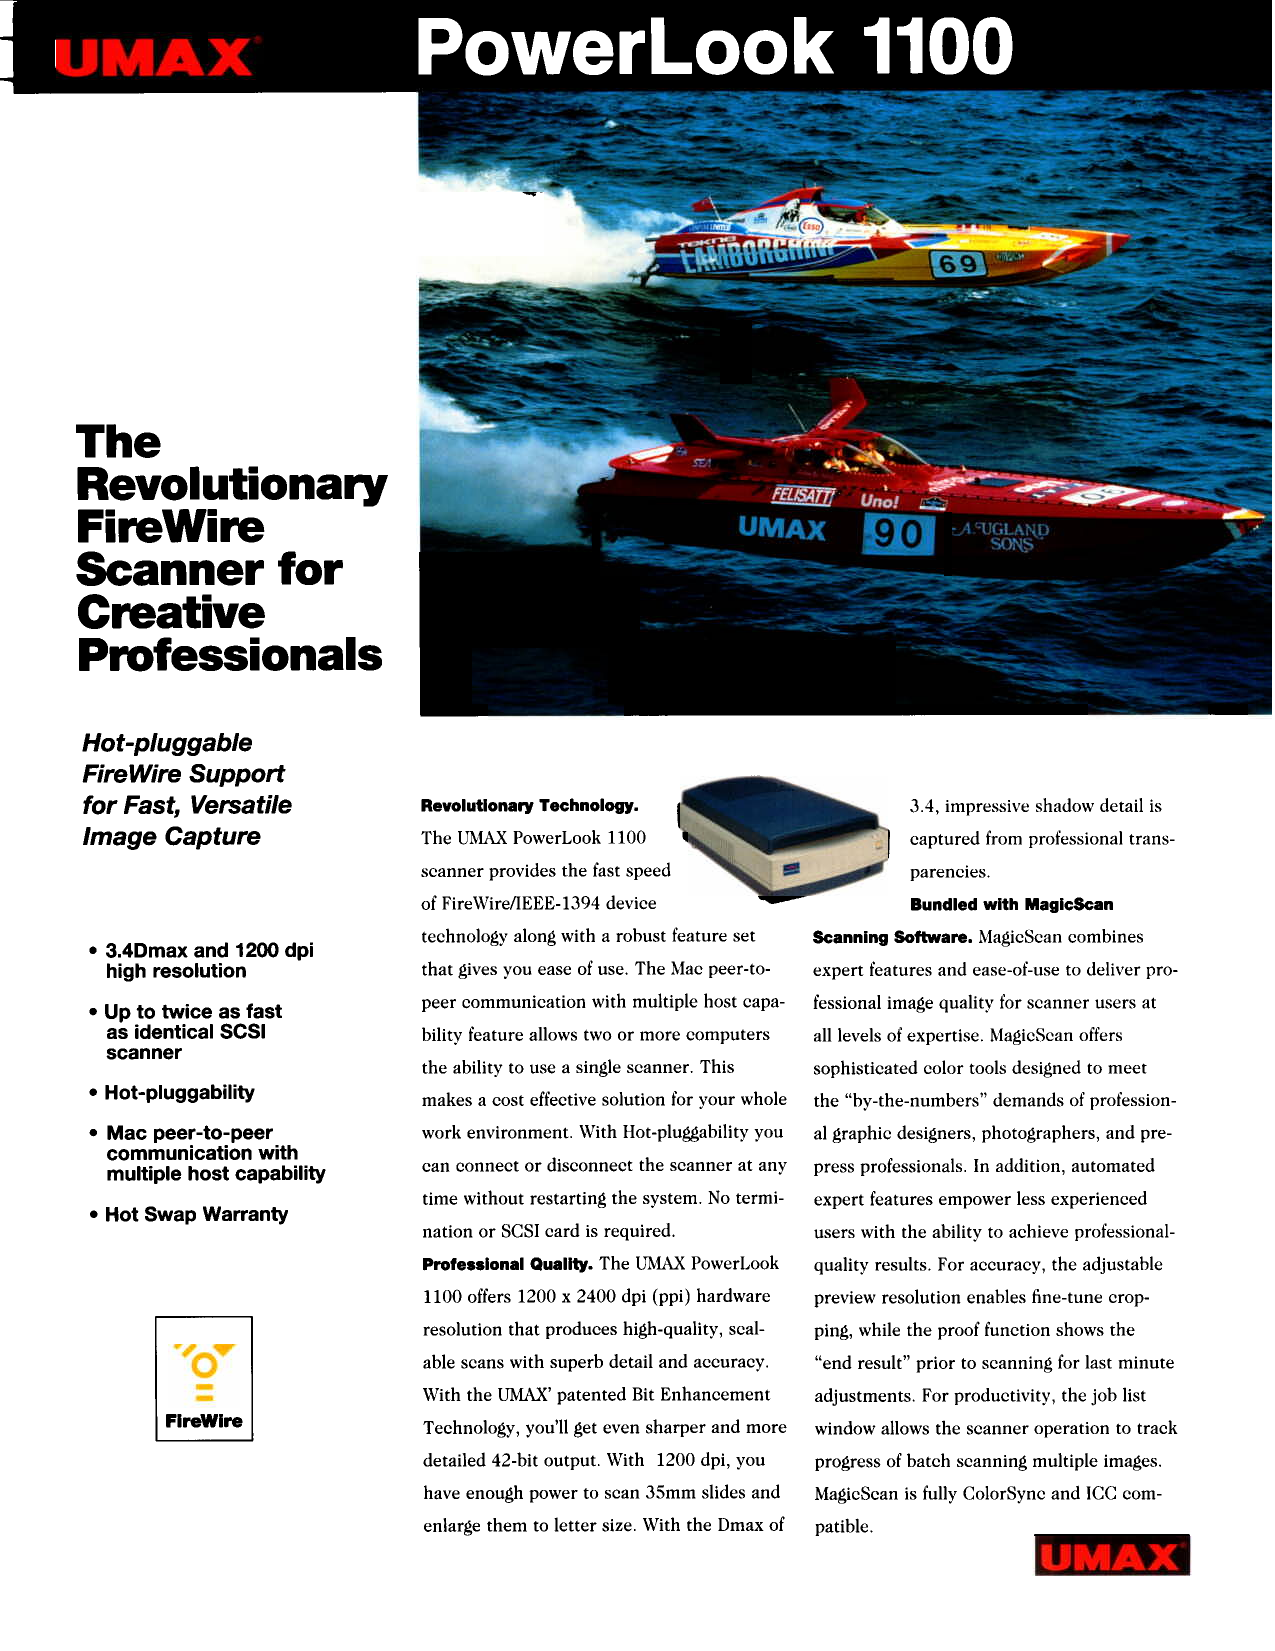 pdf for Umax Scanner PowerLook 1100 manual